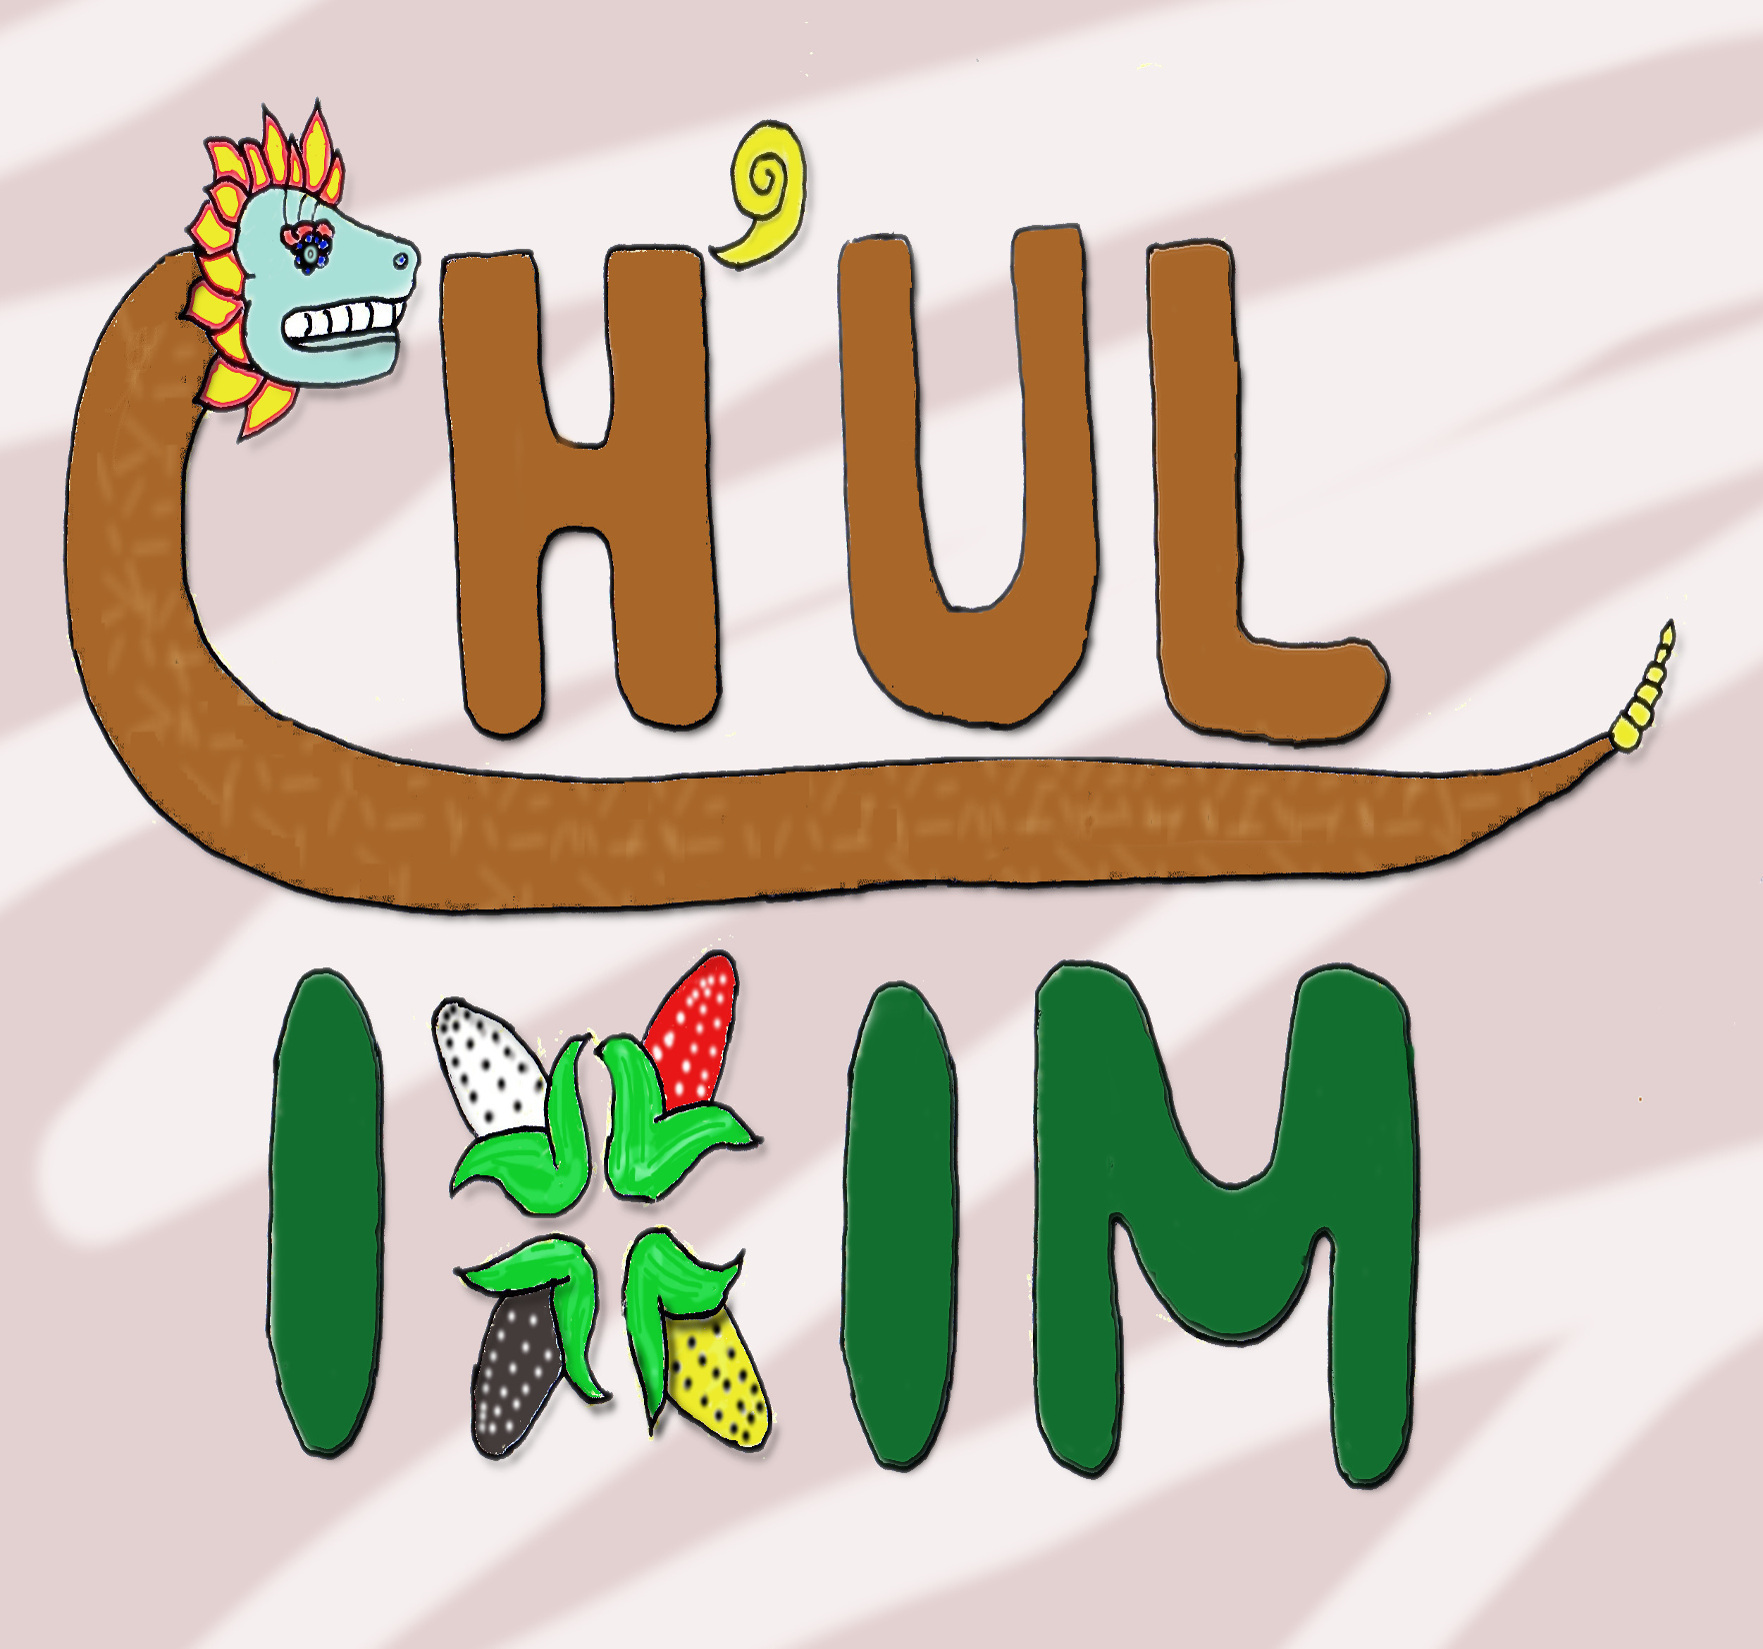 Association - CH'UL IXIM